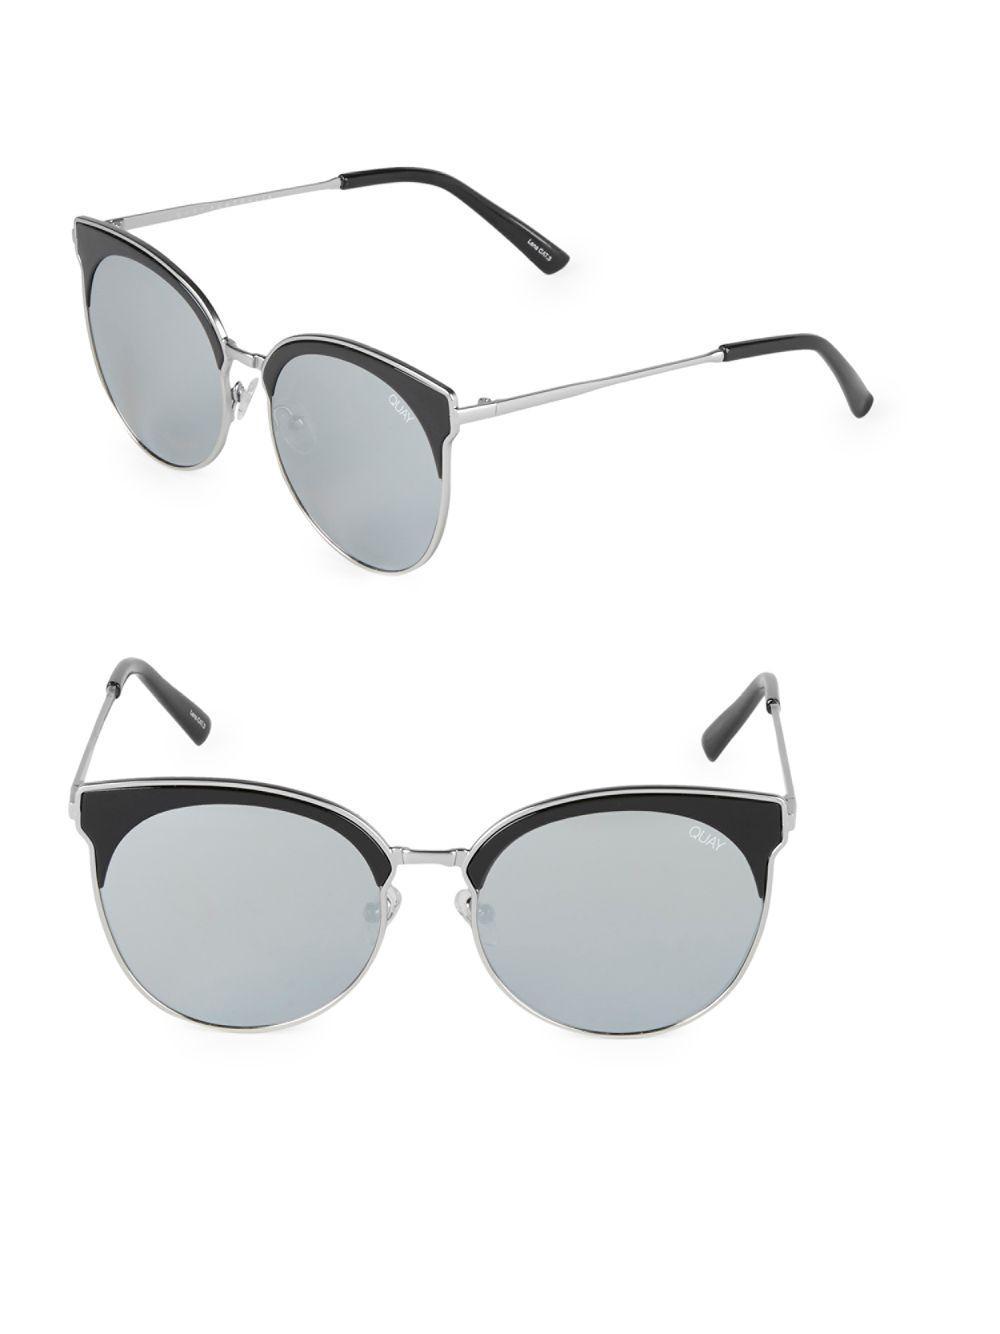 830ef554b7 Quay Mia Bella 57mm Clubmaster Sunglasses in Metallic - Lyst